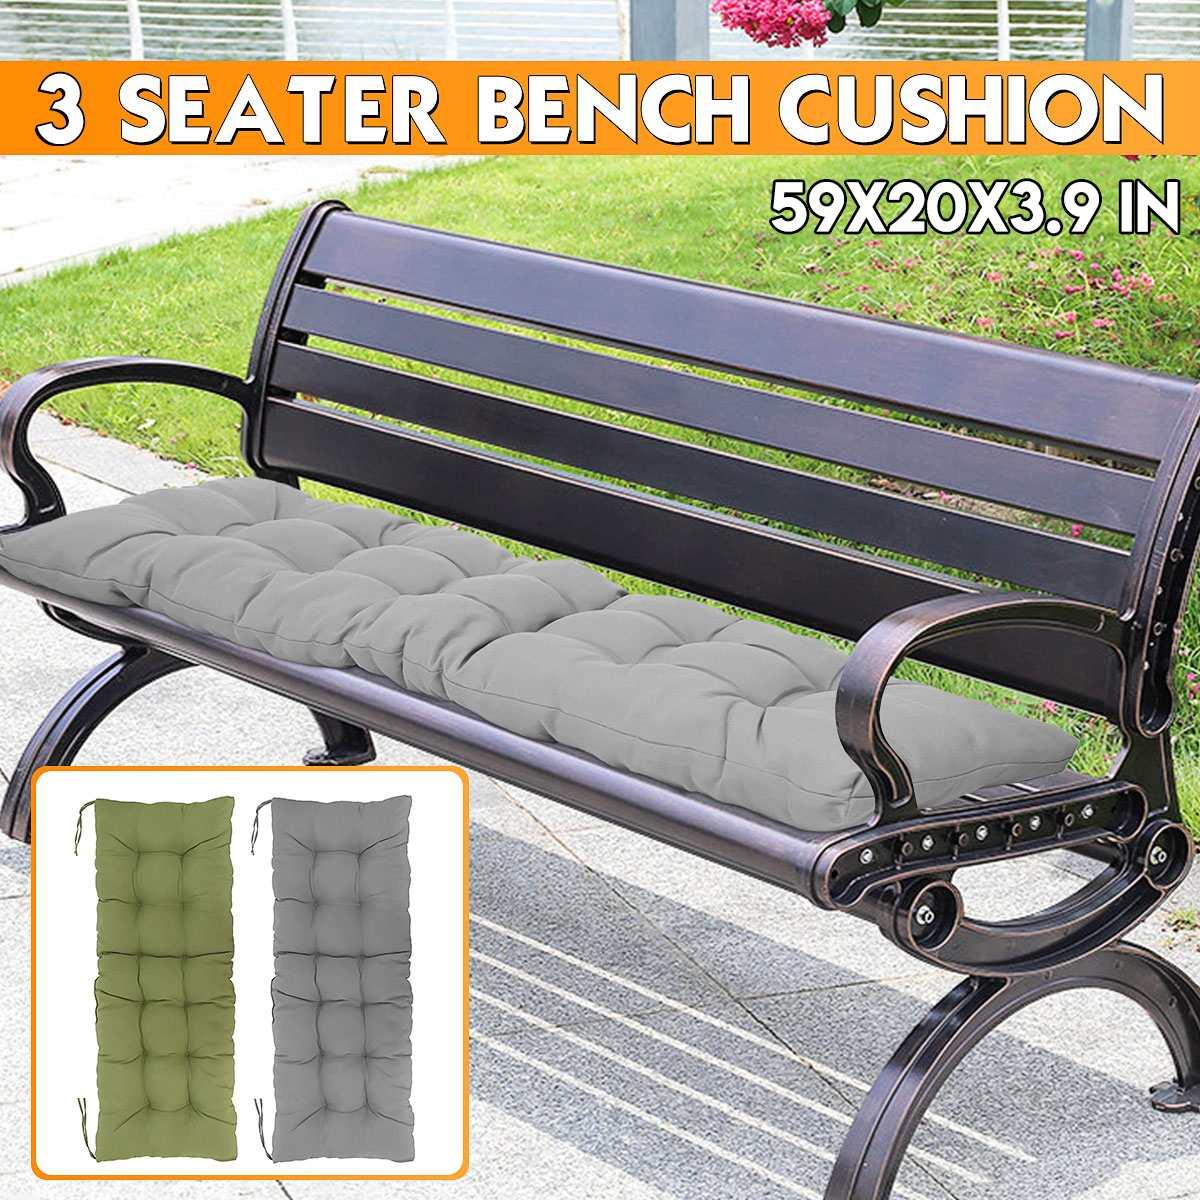 150X50X10cm Foldable Recliner Seat Cushion Furniture Patio Rocking Chairs Pad Cushions Soft Lounger Bench Seat Chair Cushion Mat